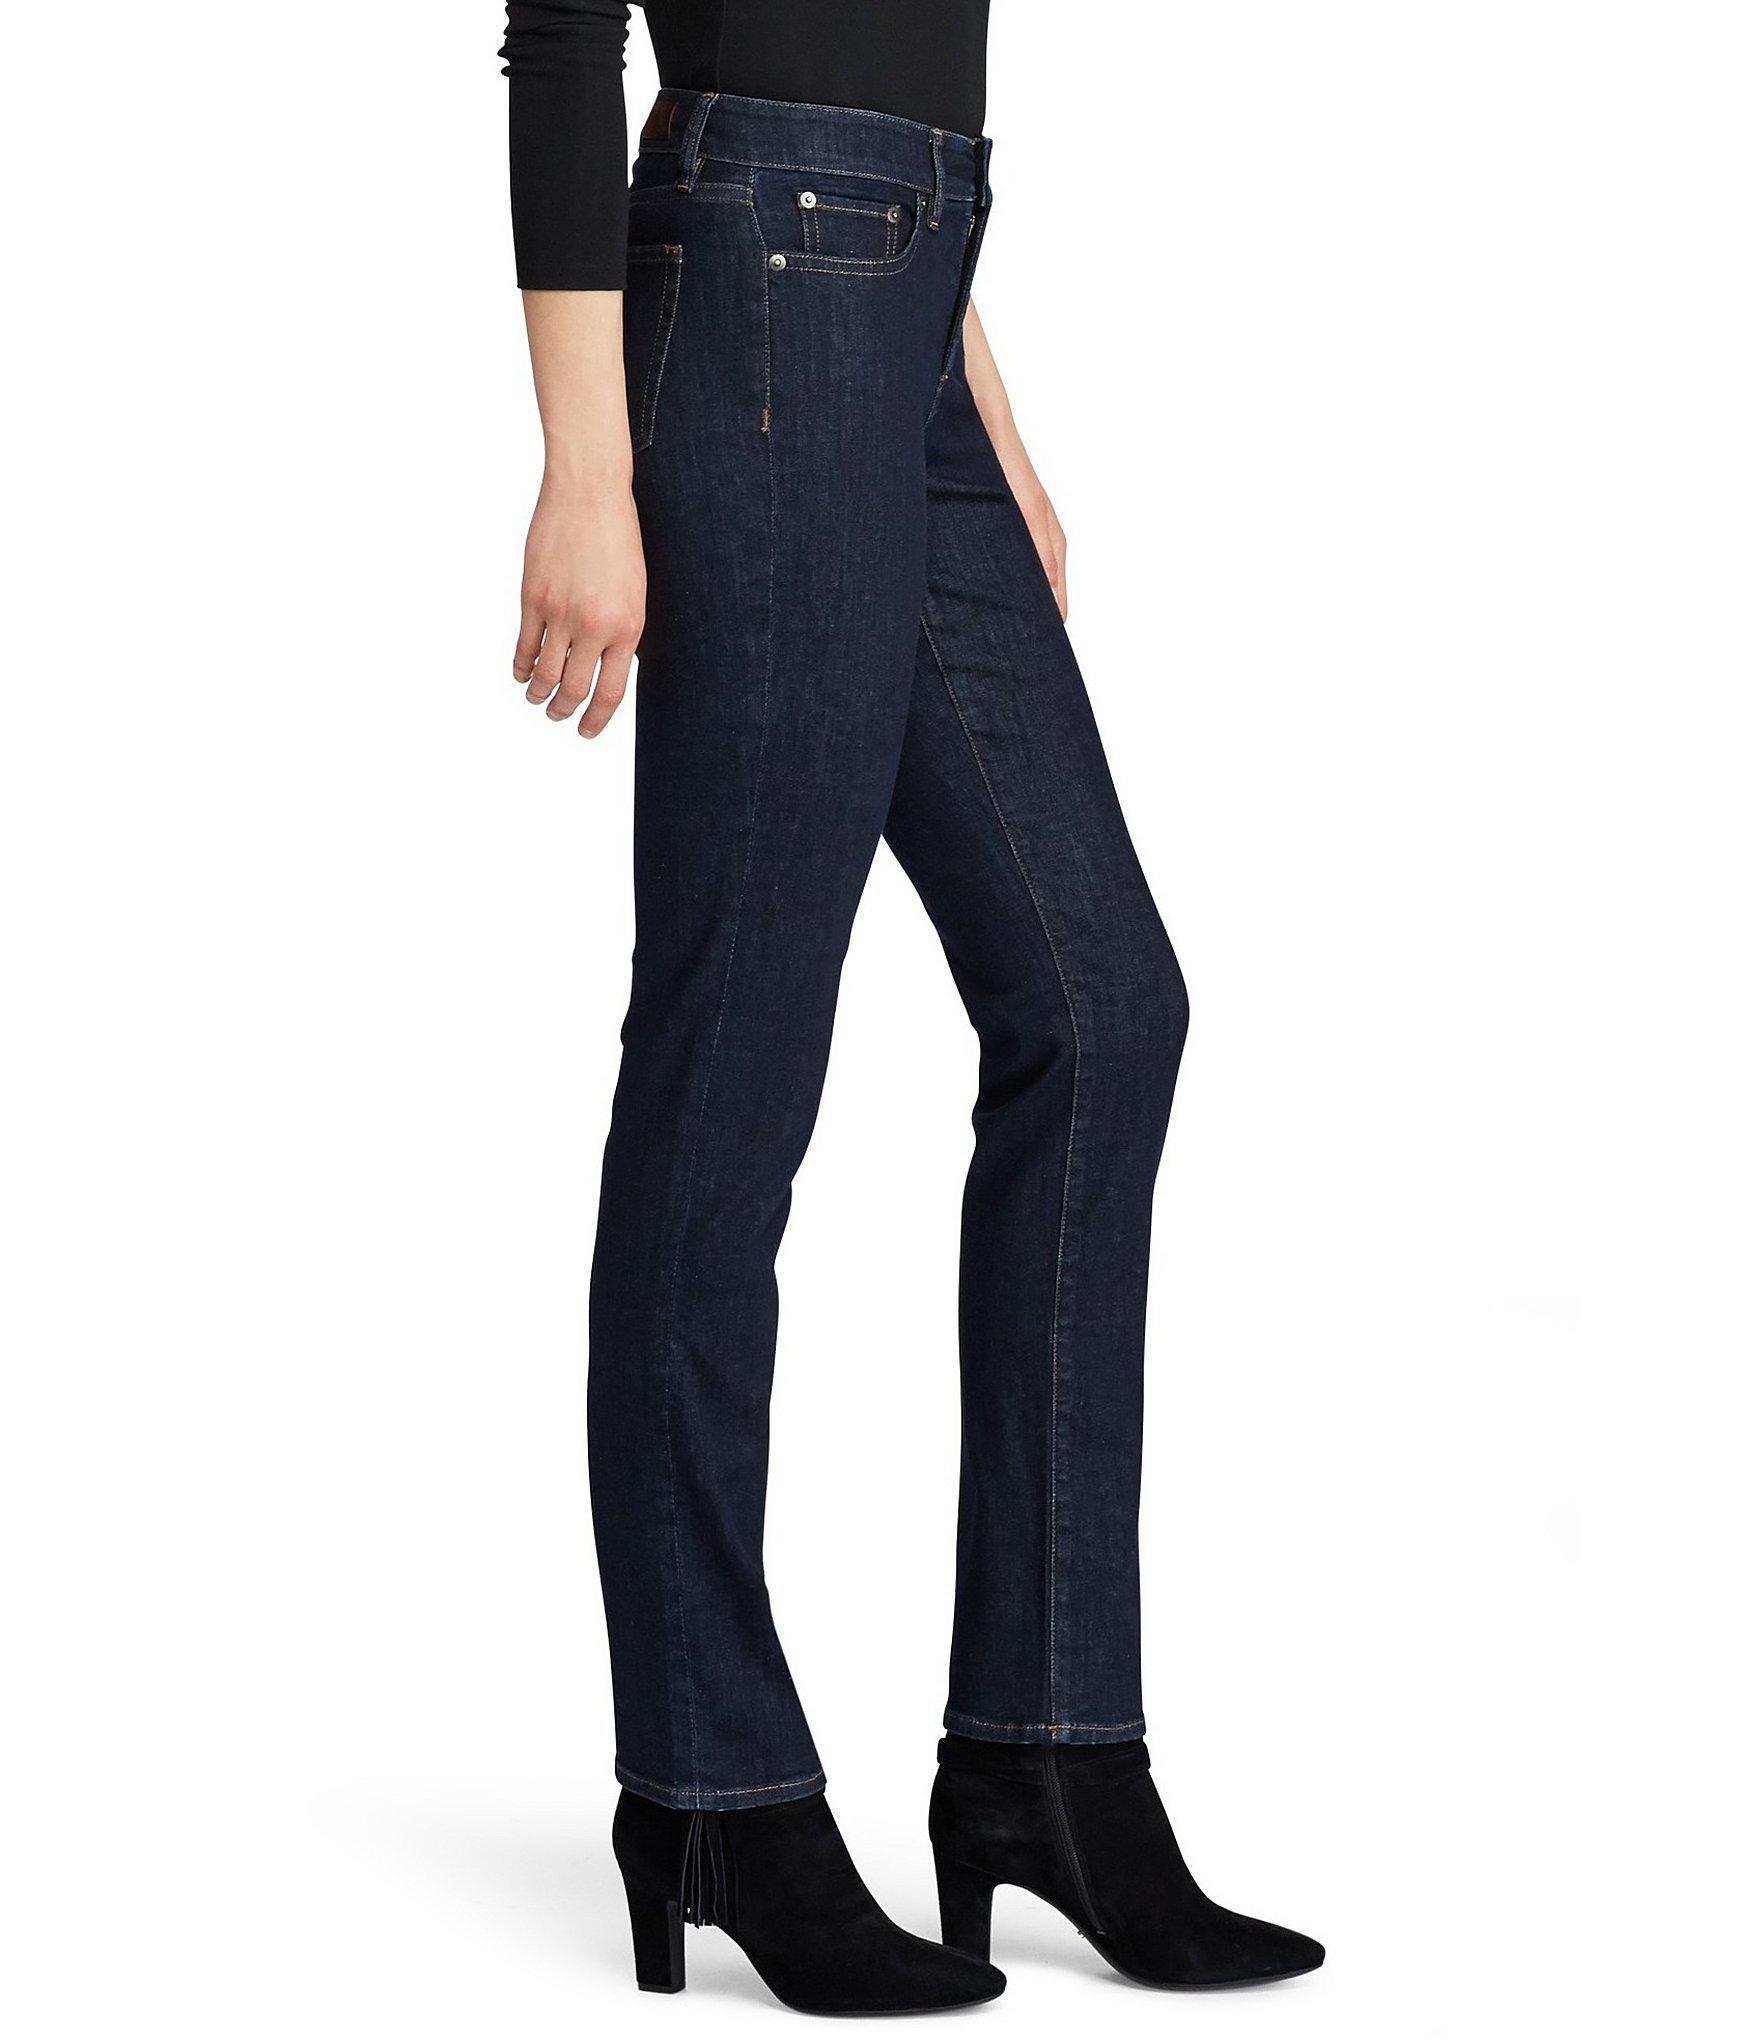 e701431f3b36c Lauren by Ralph Lauren - Blue Ultimate Slimming Premier Straight Curvy Jeans  - Lyst. View fullscreen